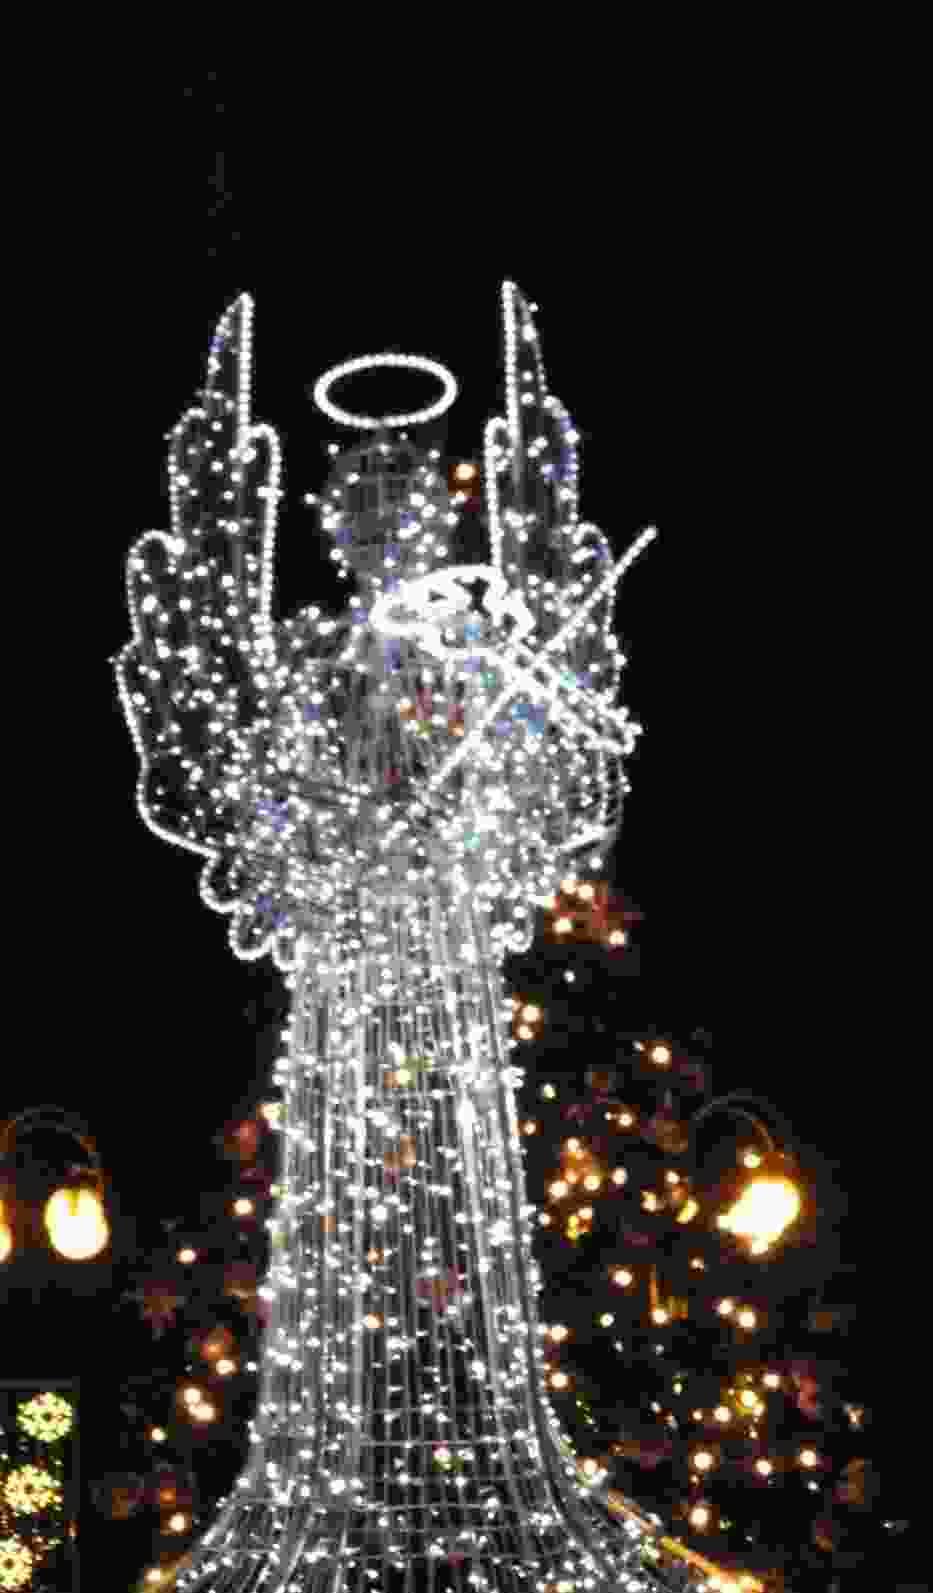 Anioł na placu Biegańskiego